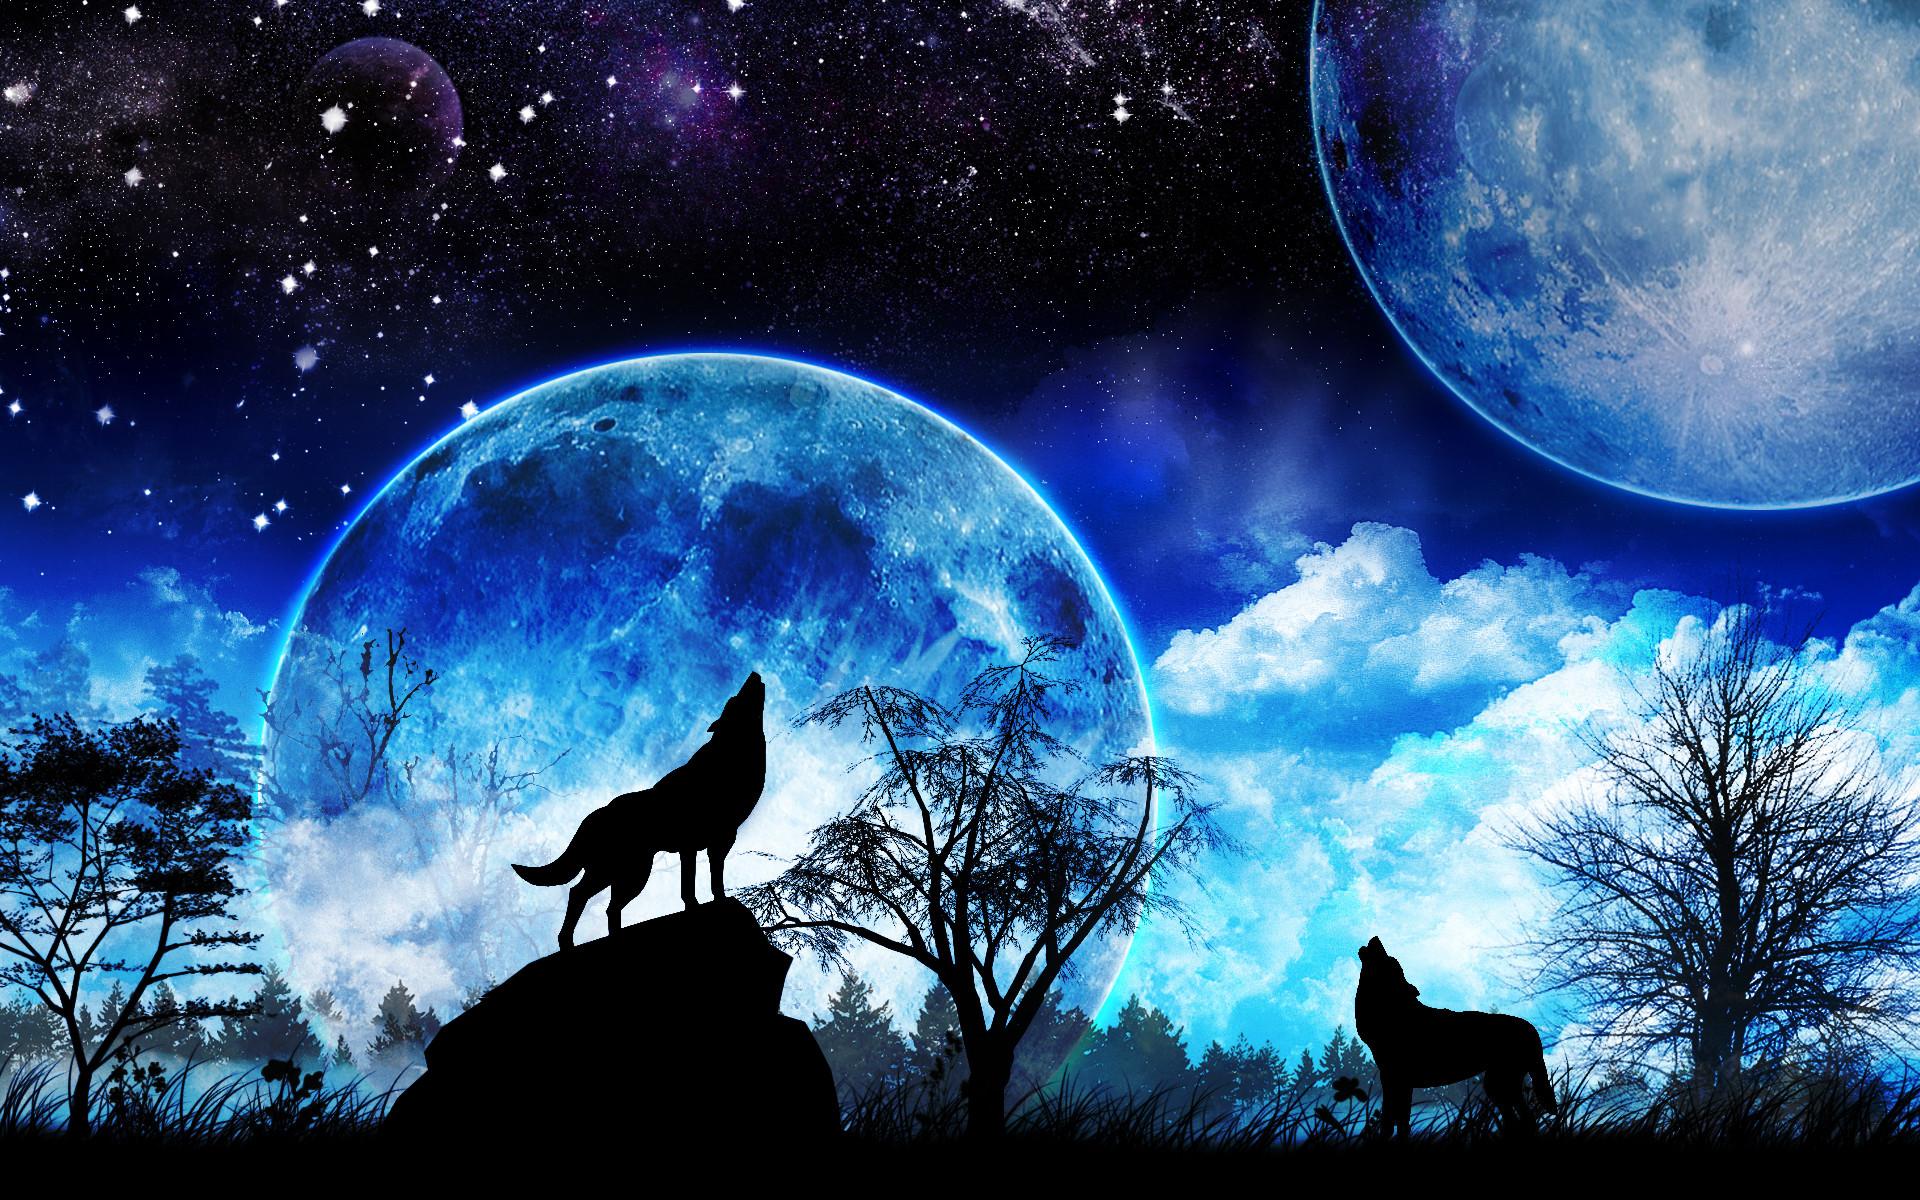 Mythical Galaxy Wolf Night Sky Galaxy Cool Wallpaper